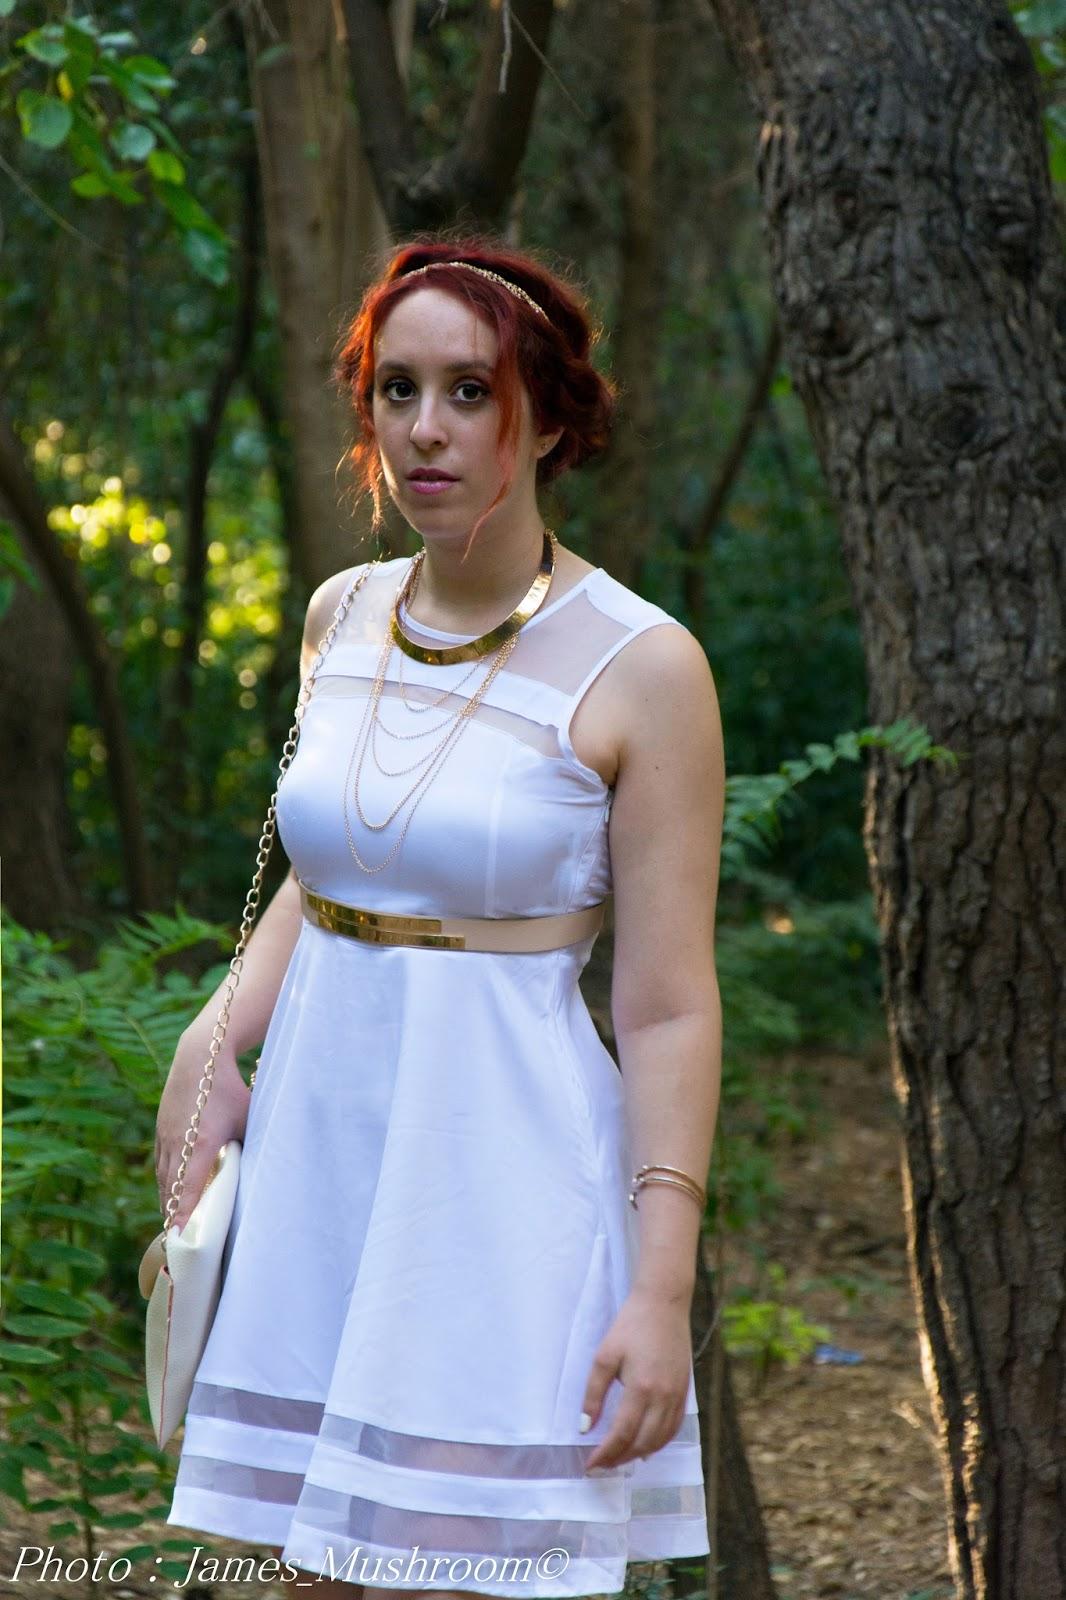 fashion, redhead,hot, sexy, white , dress, romwe, review, dresslink, online shopping, H&M, Anna Keni, Anna, blogger, model, spotlights on the redhead, princess, fuck it, fuck it Im gonna be a princess